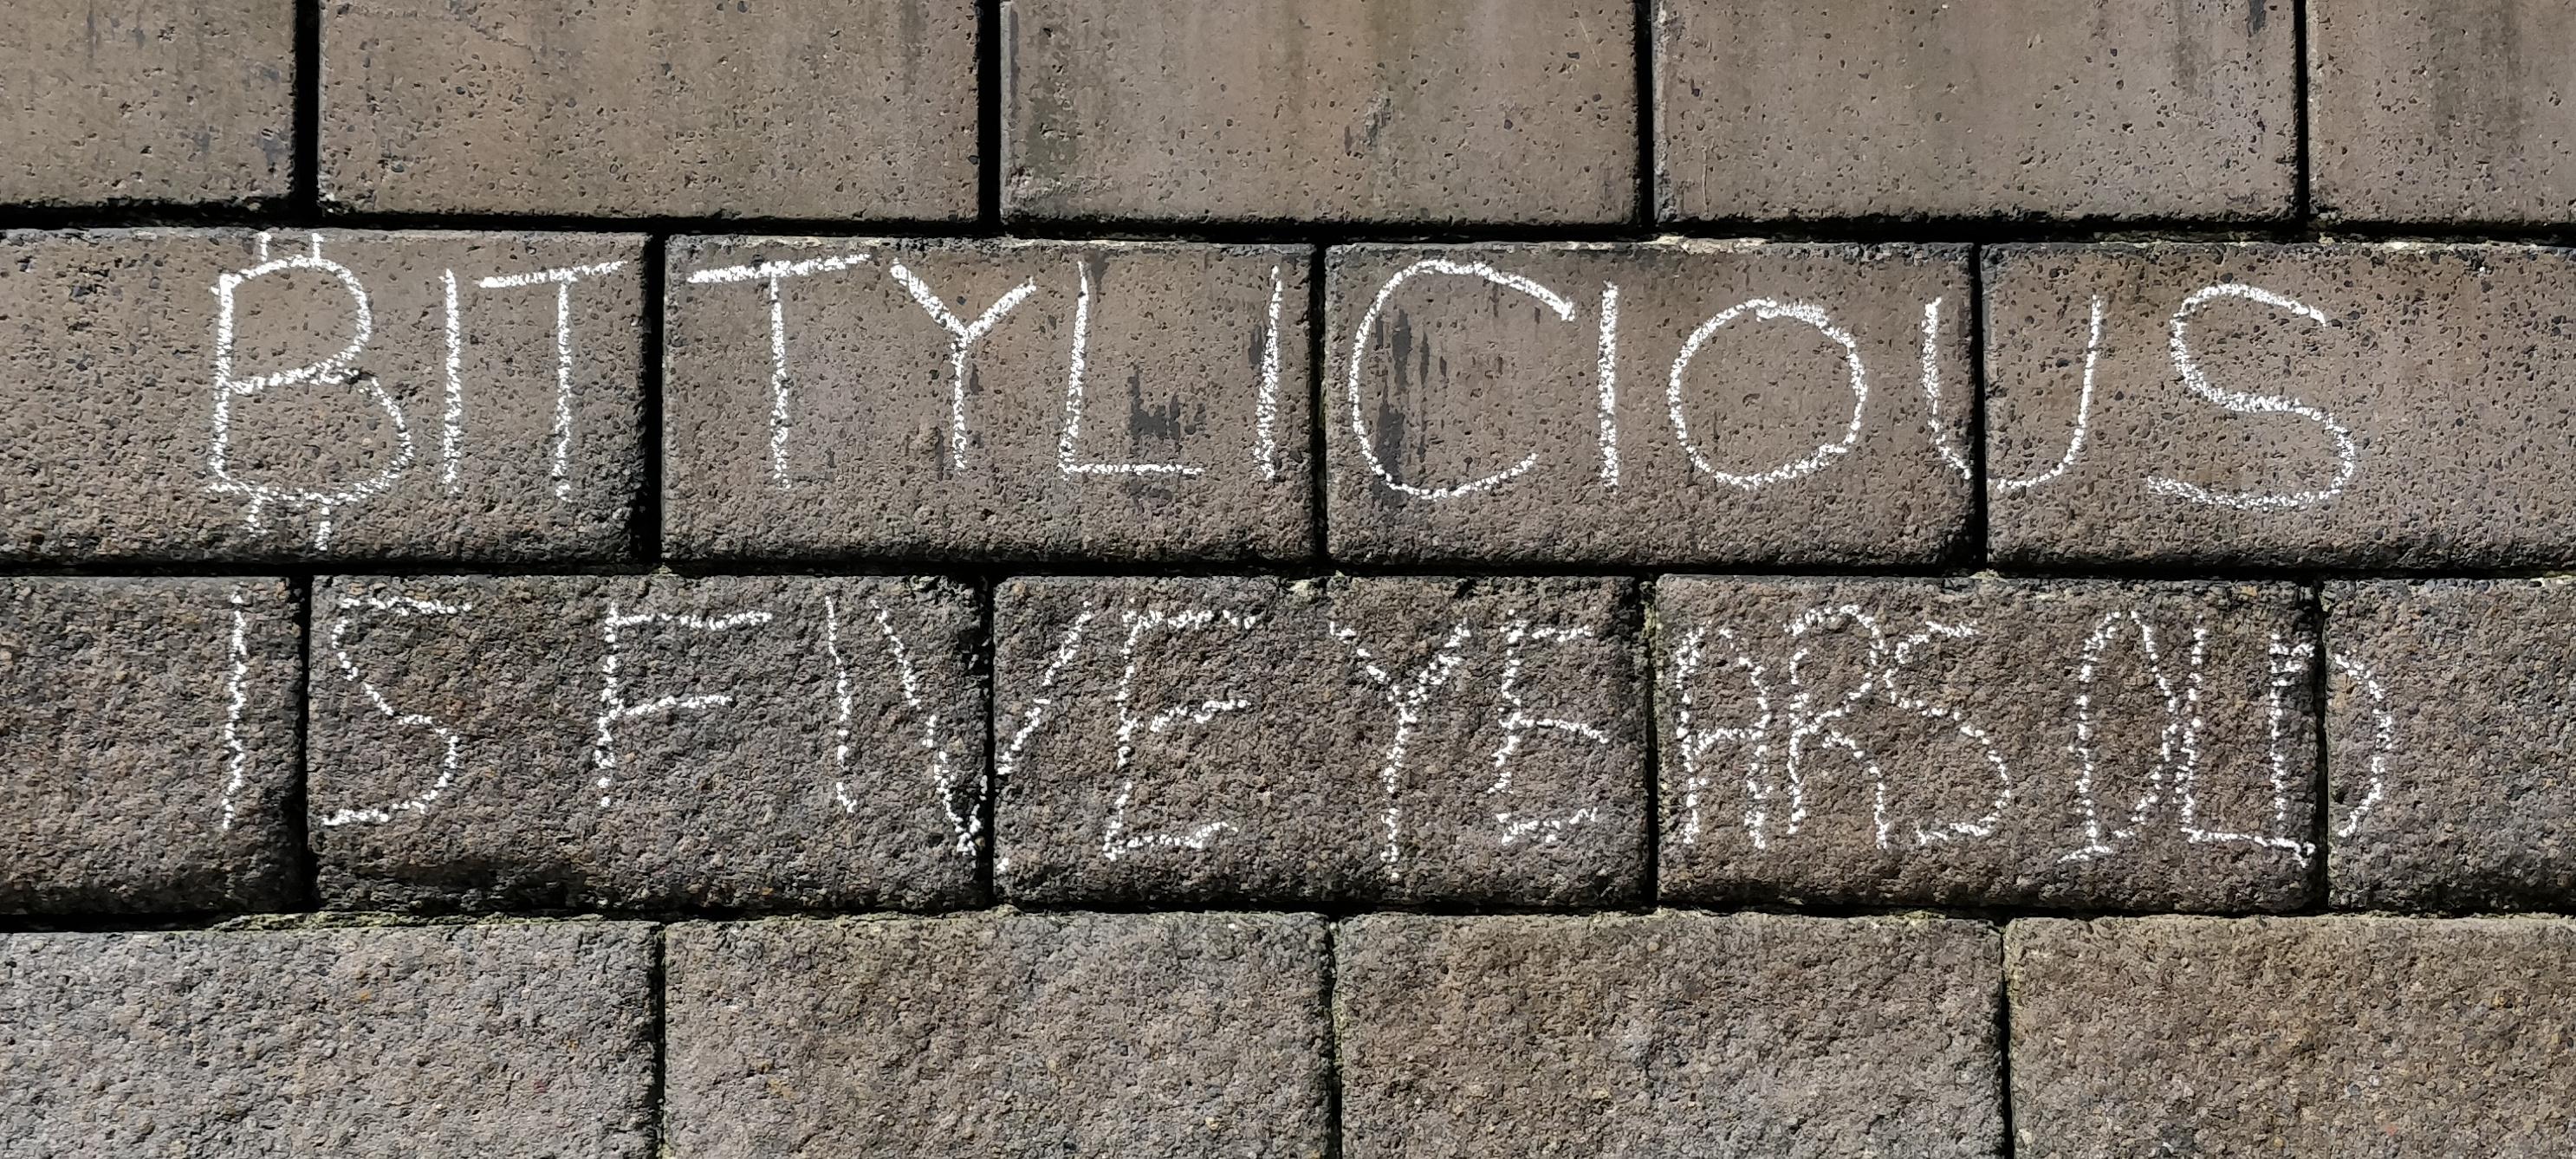 Bittylicious Blog – News and Ramblings on Bittylicious and